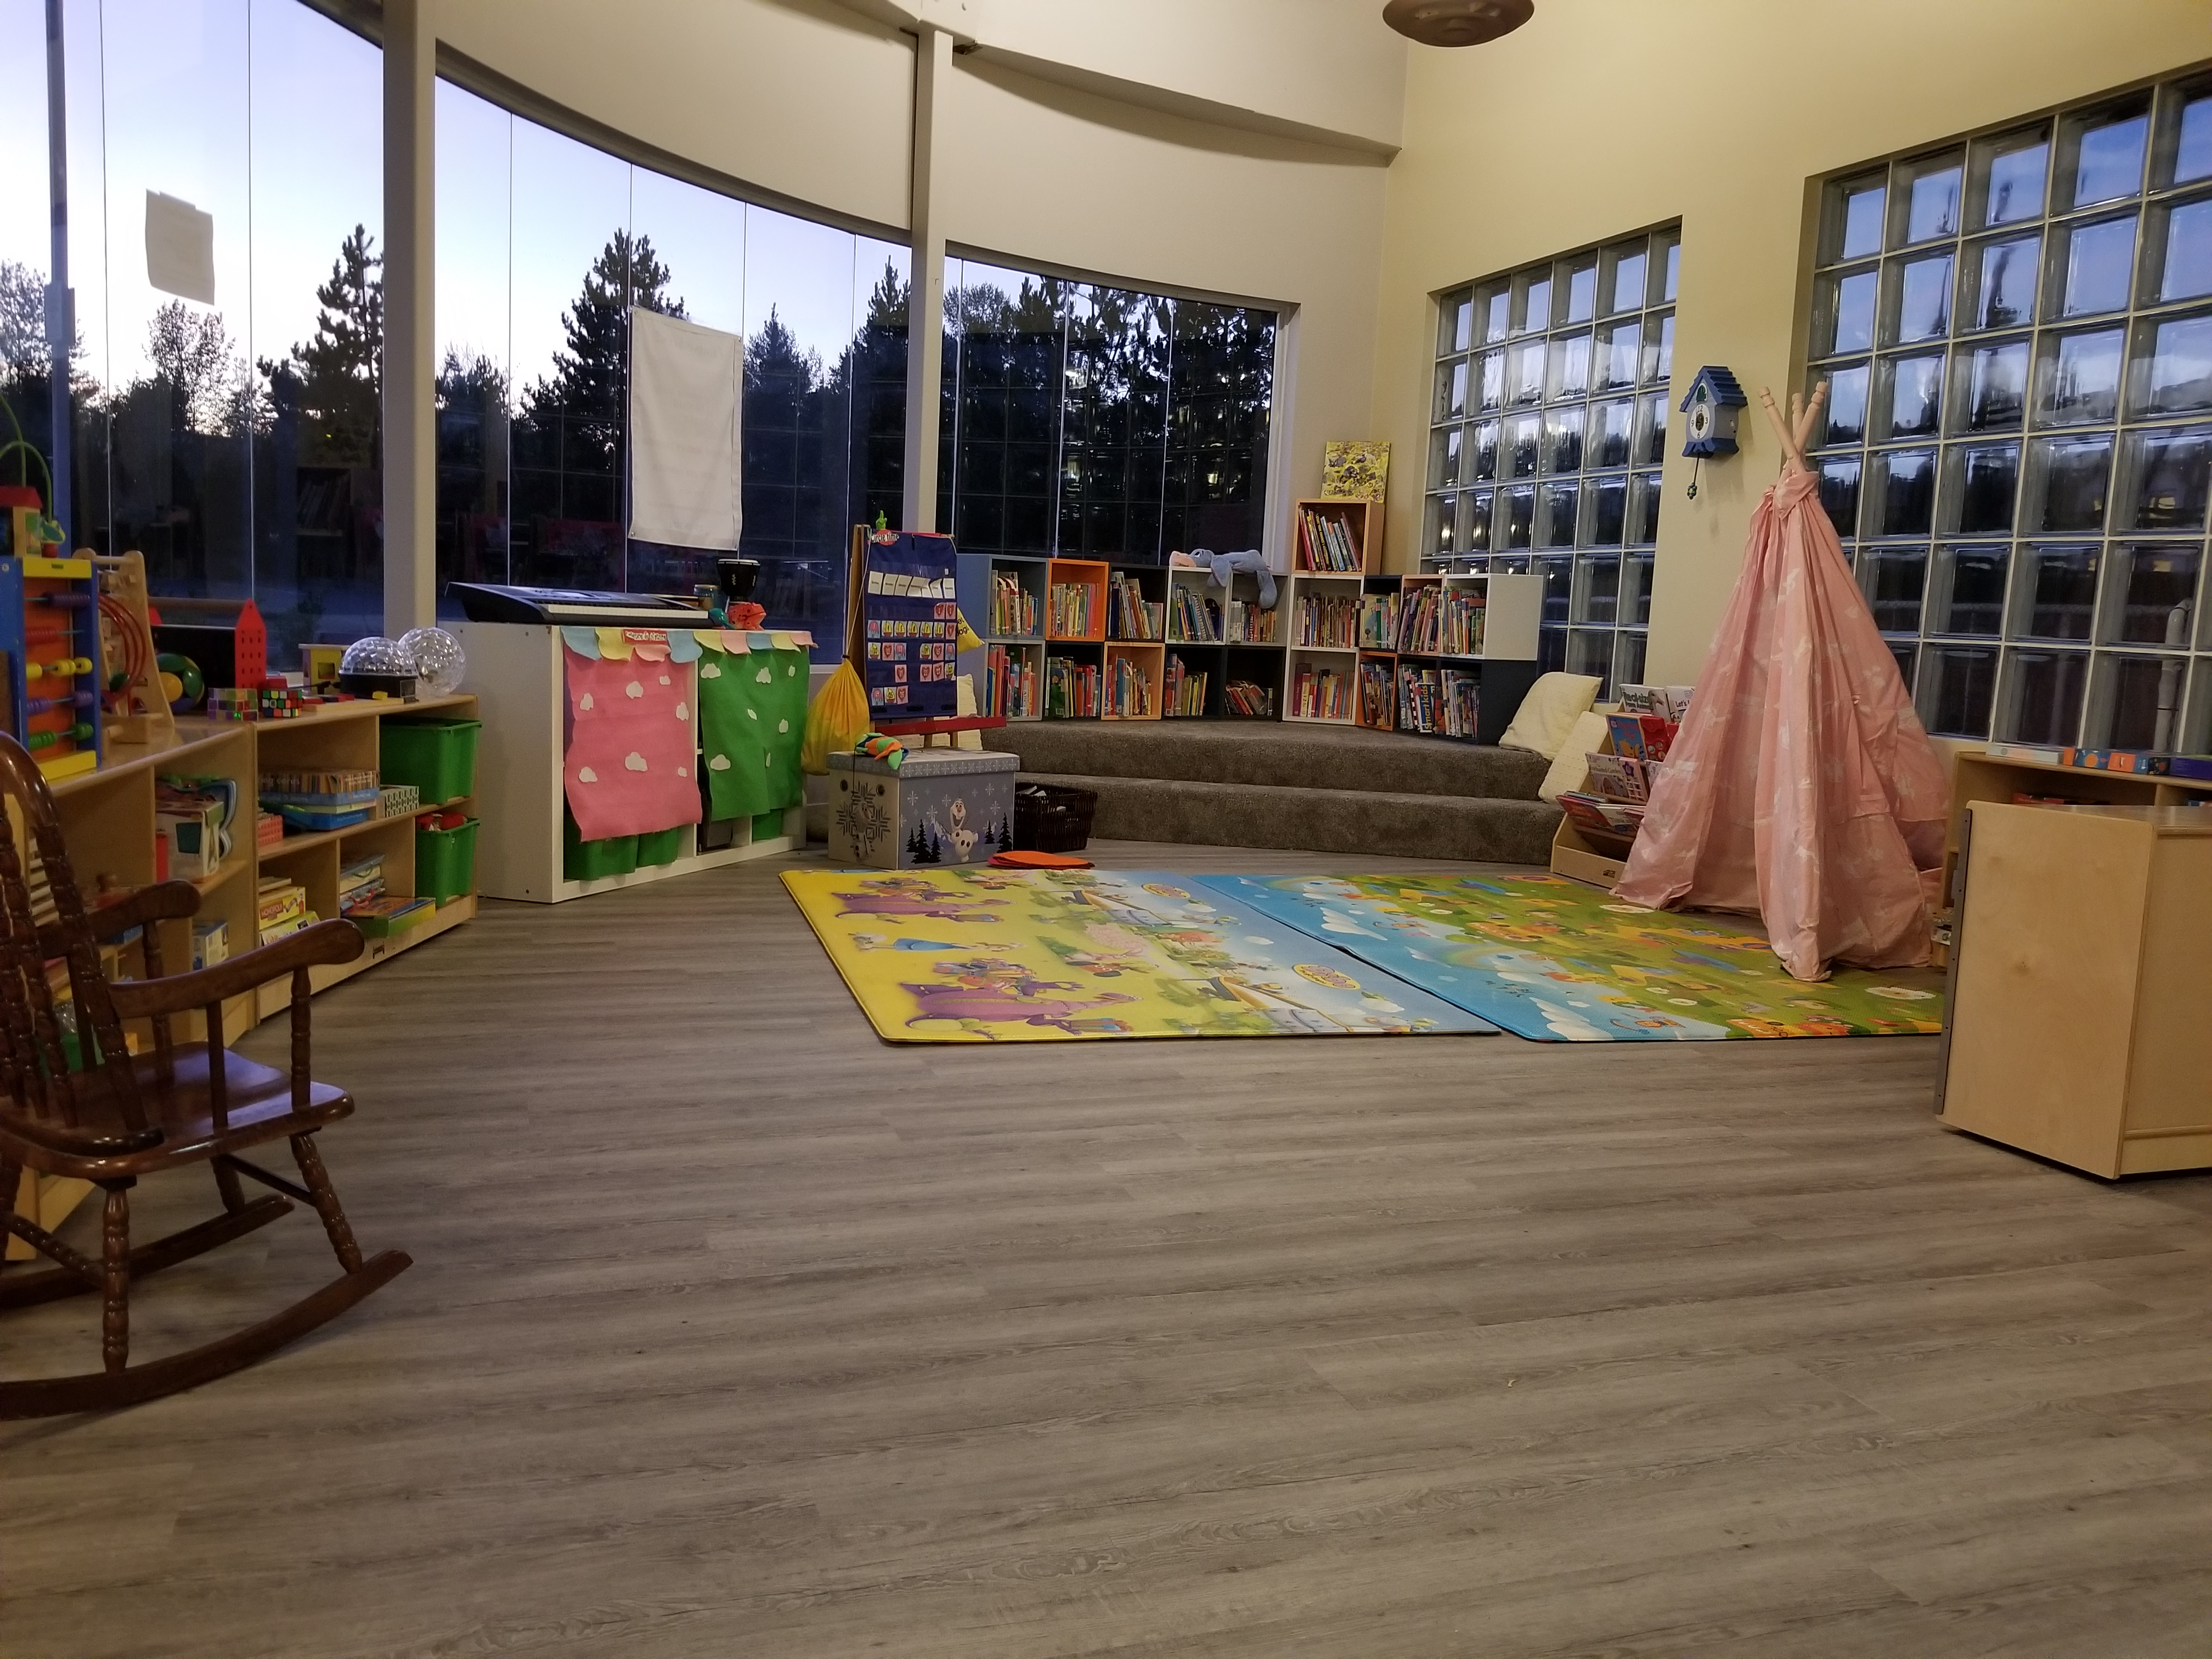 Preschool abbotsford main activity